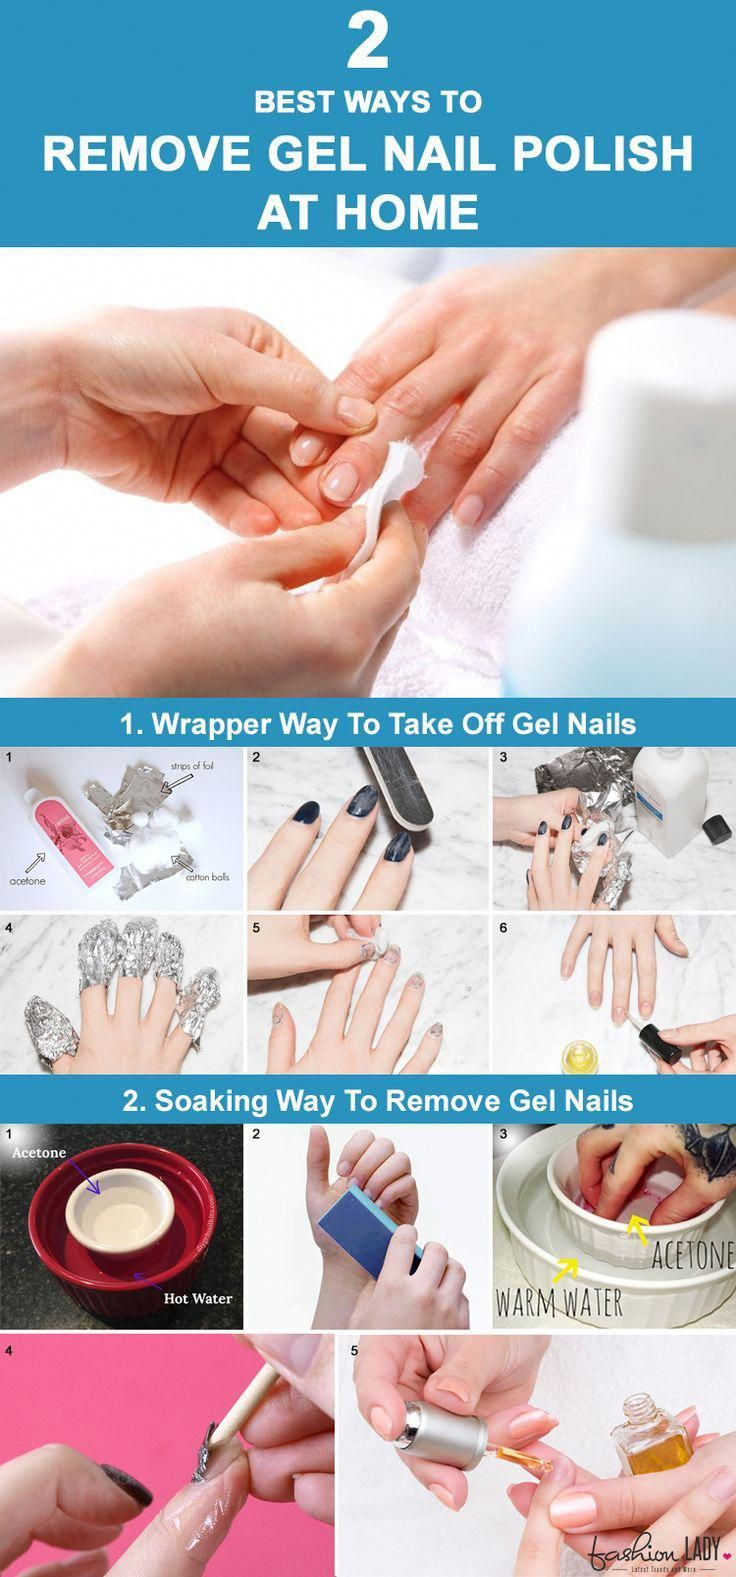 2 Best Ways To Remove Gel Nail Polish At Home Removinggelnailpolishathome Gel Nail Removal Take Off Gel Nails Gel Nail Varnish